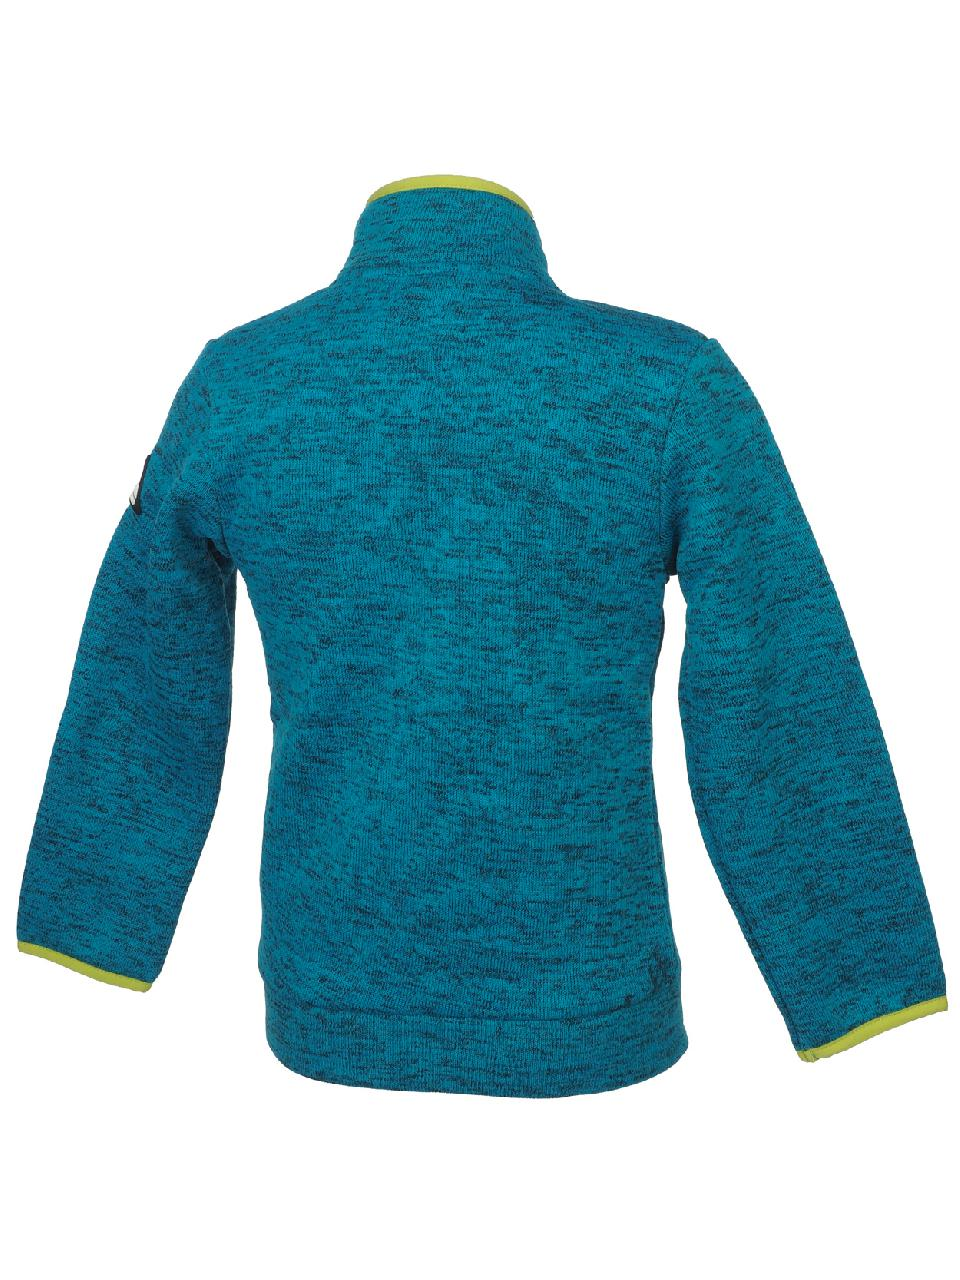 Vestes-polaire-Longboard-Pol-bleu-ch-polaire-cadet-Bleu-50668-Neuf